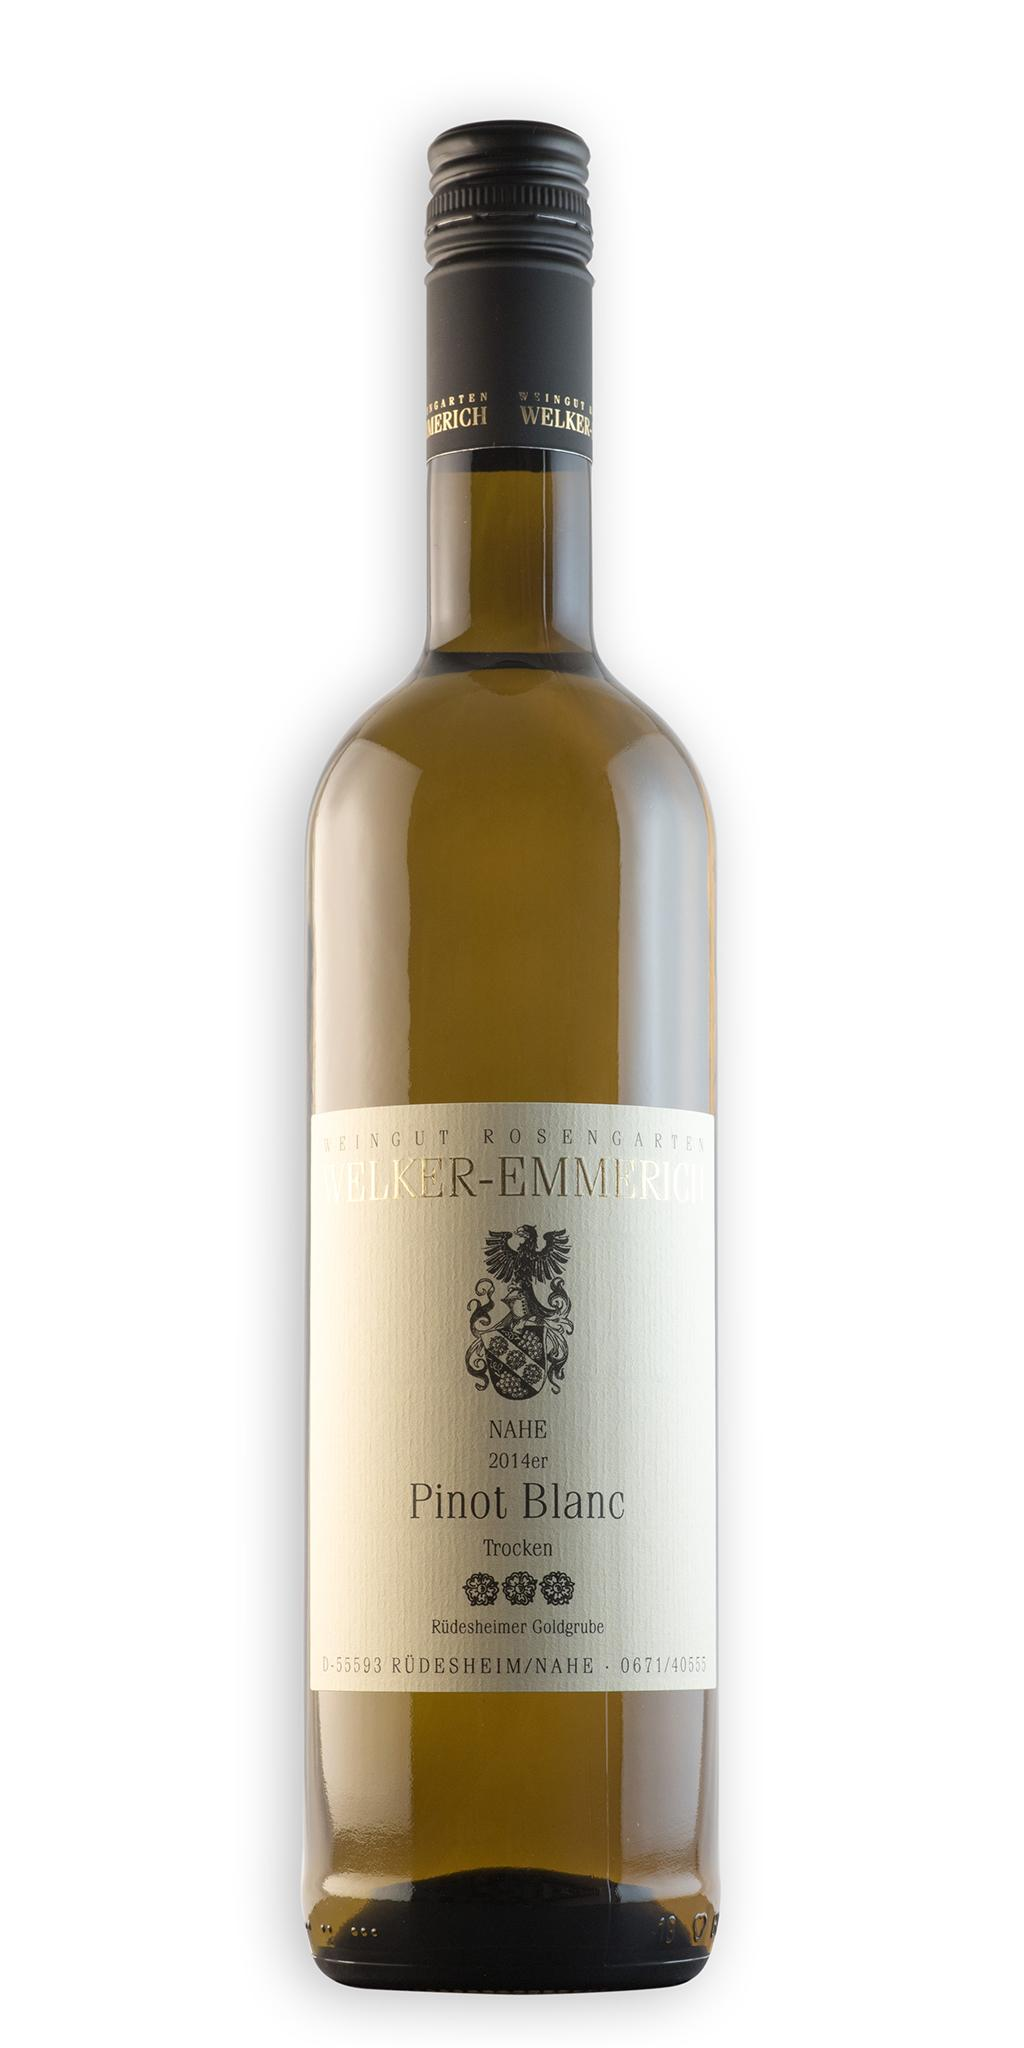 Pinot Blanc - Edition 3 Rosen - 2015 / Welker-Emmerich